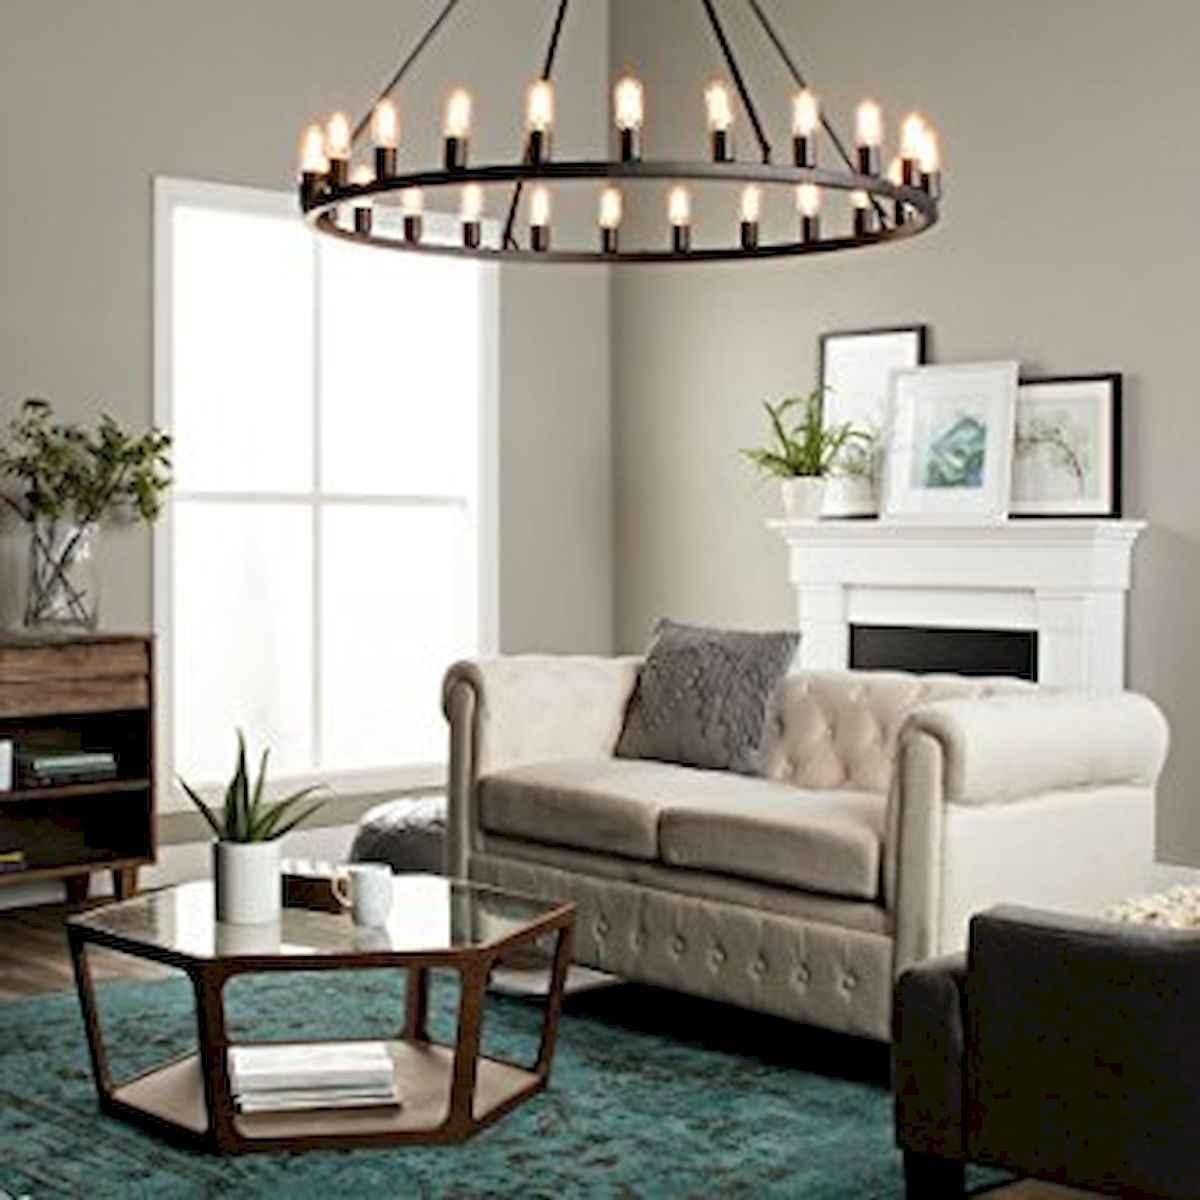 60 Farmhouse Living Room Lighting Ideas Decor And Design (8)